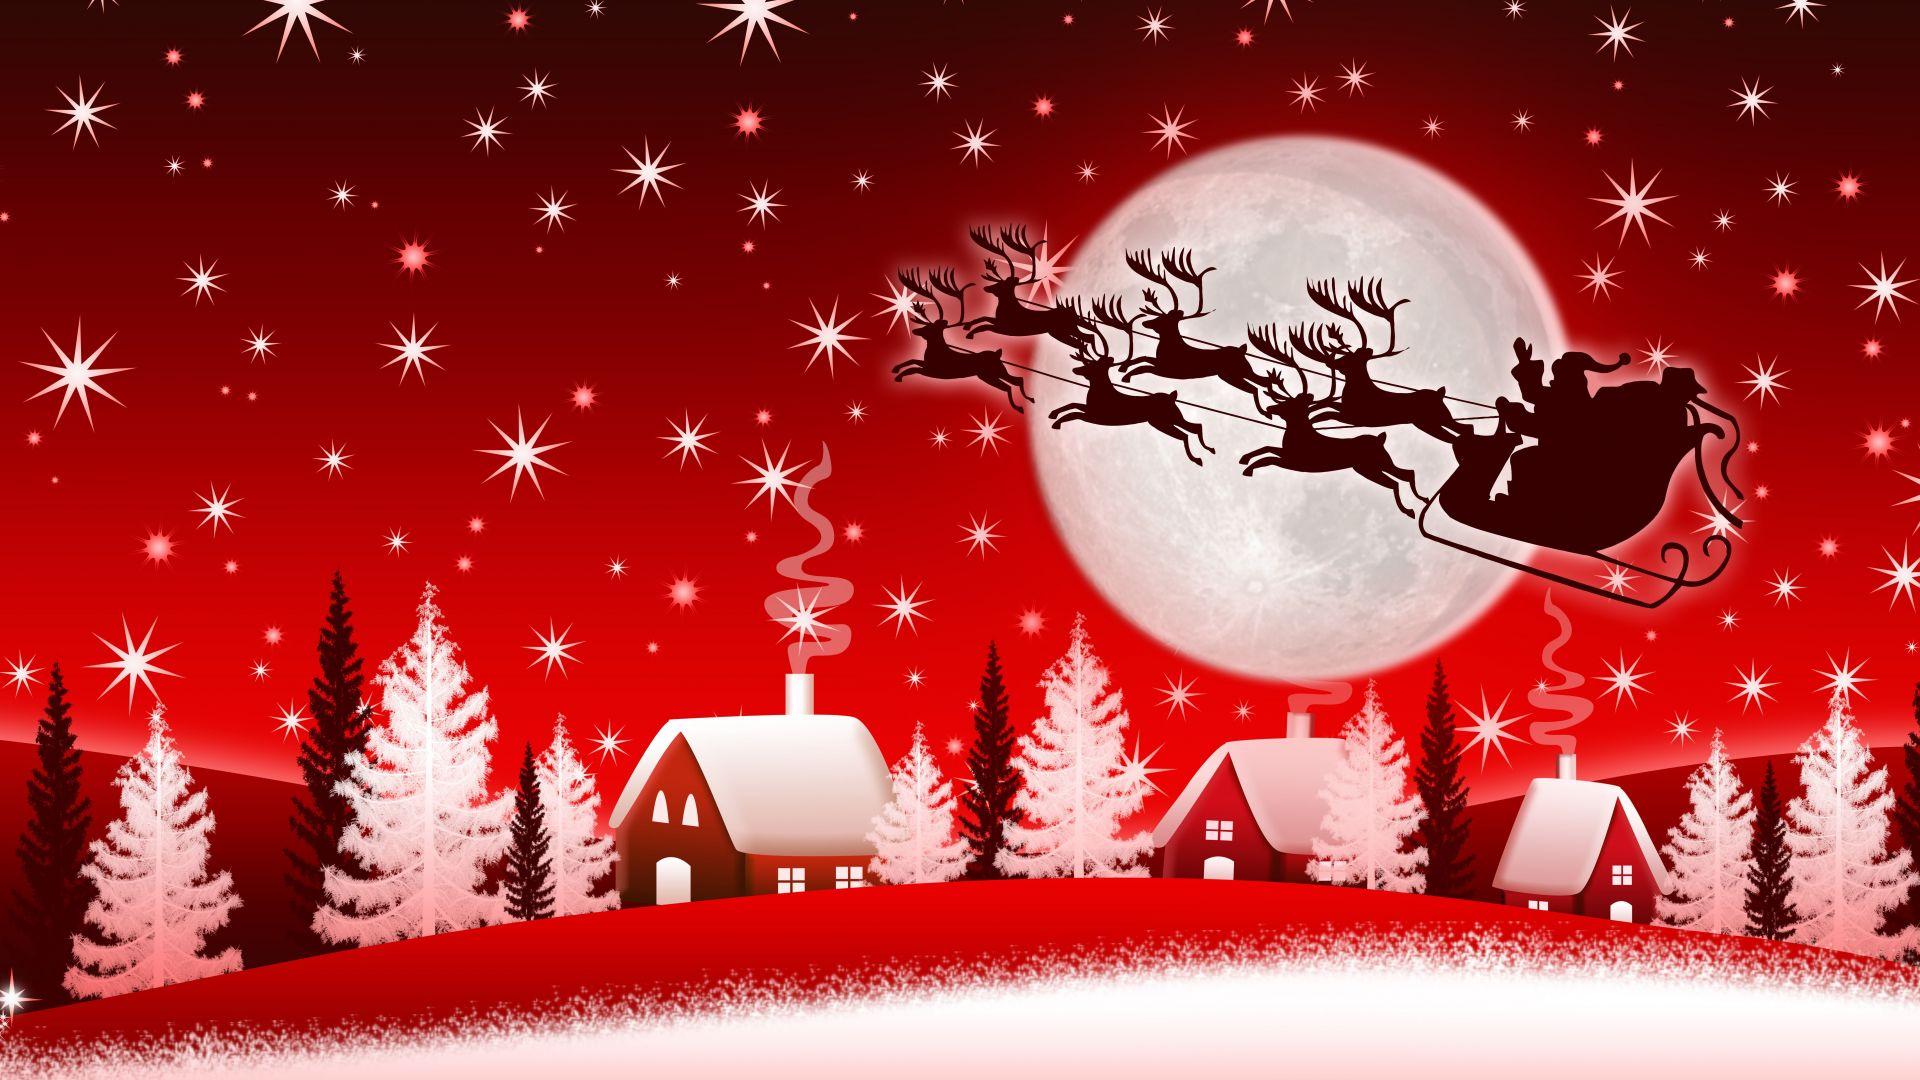 Wallpaper Christmas, New Year, Santa, Deer, Moon, Winter